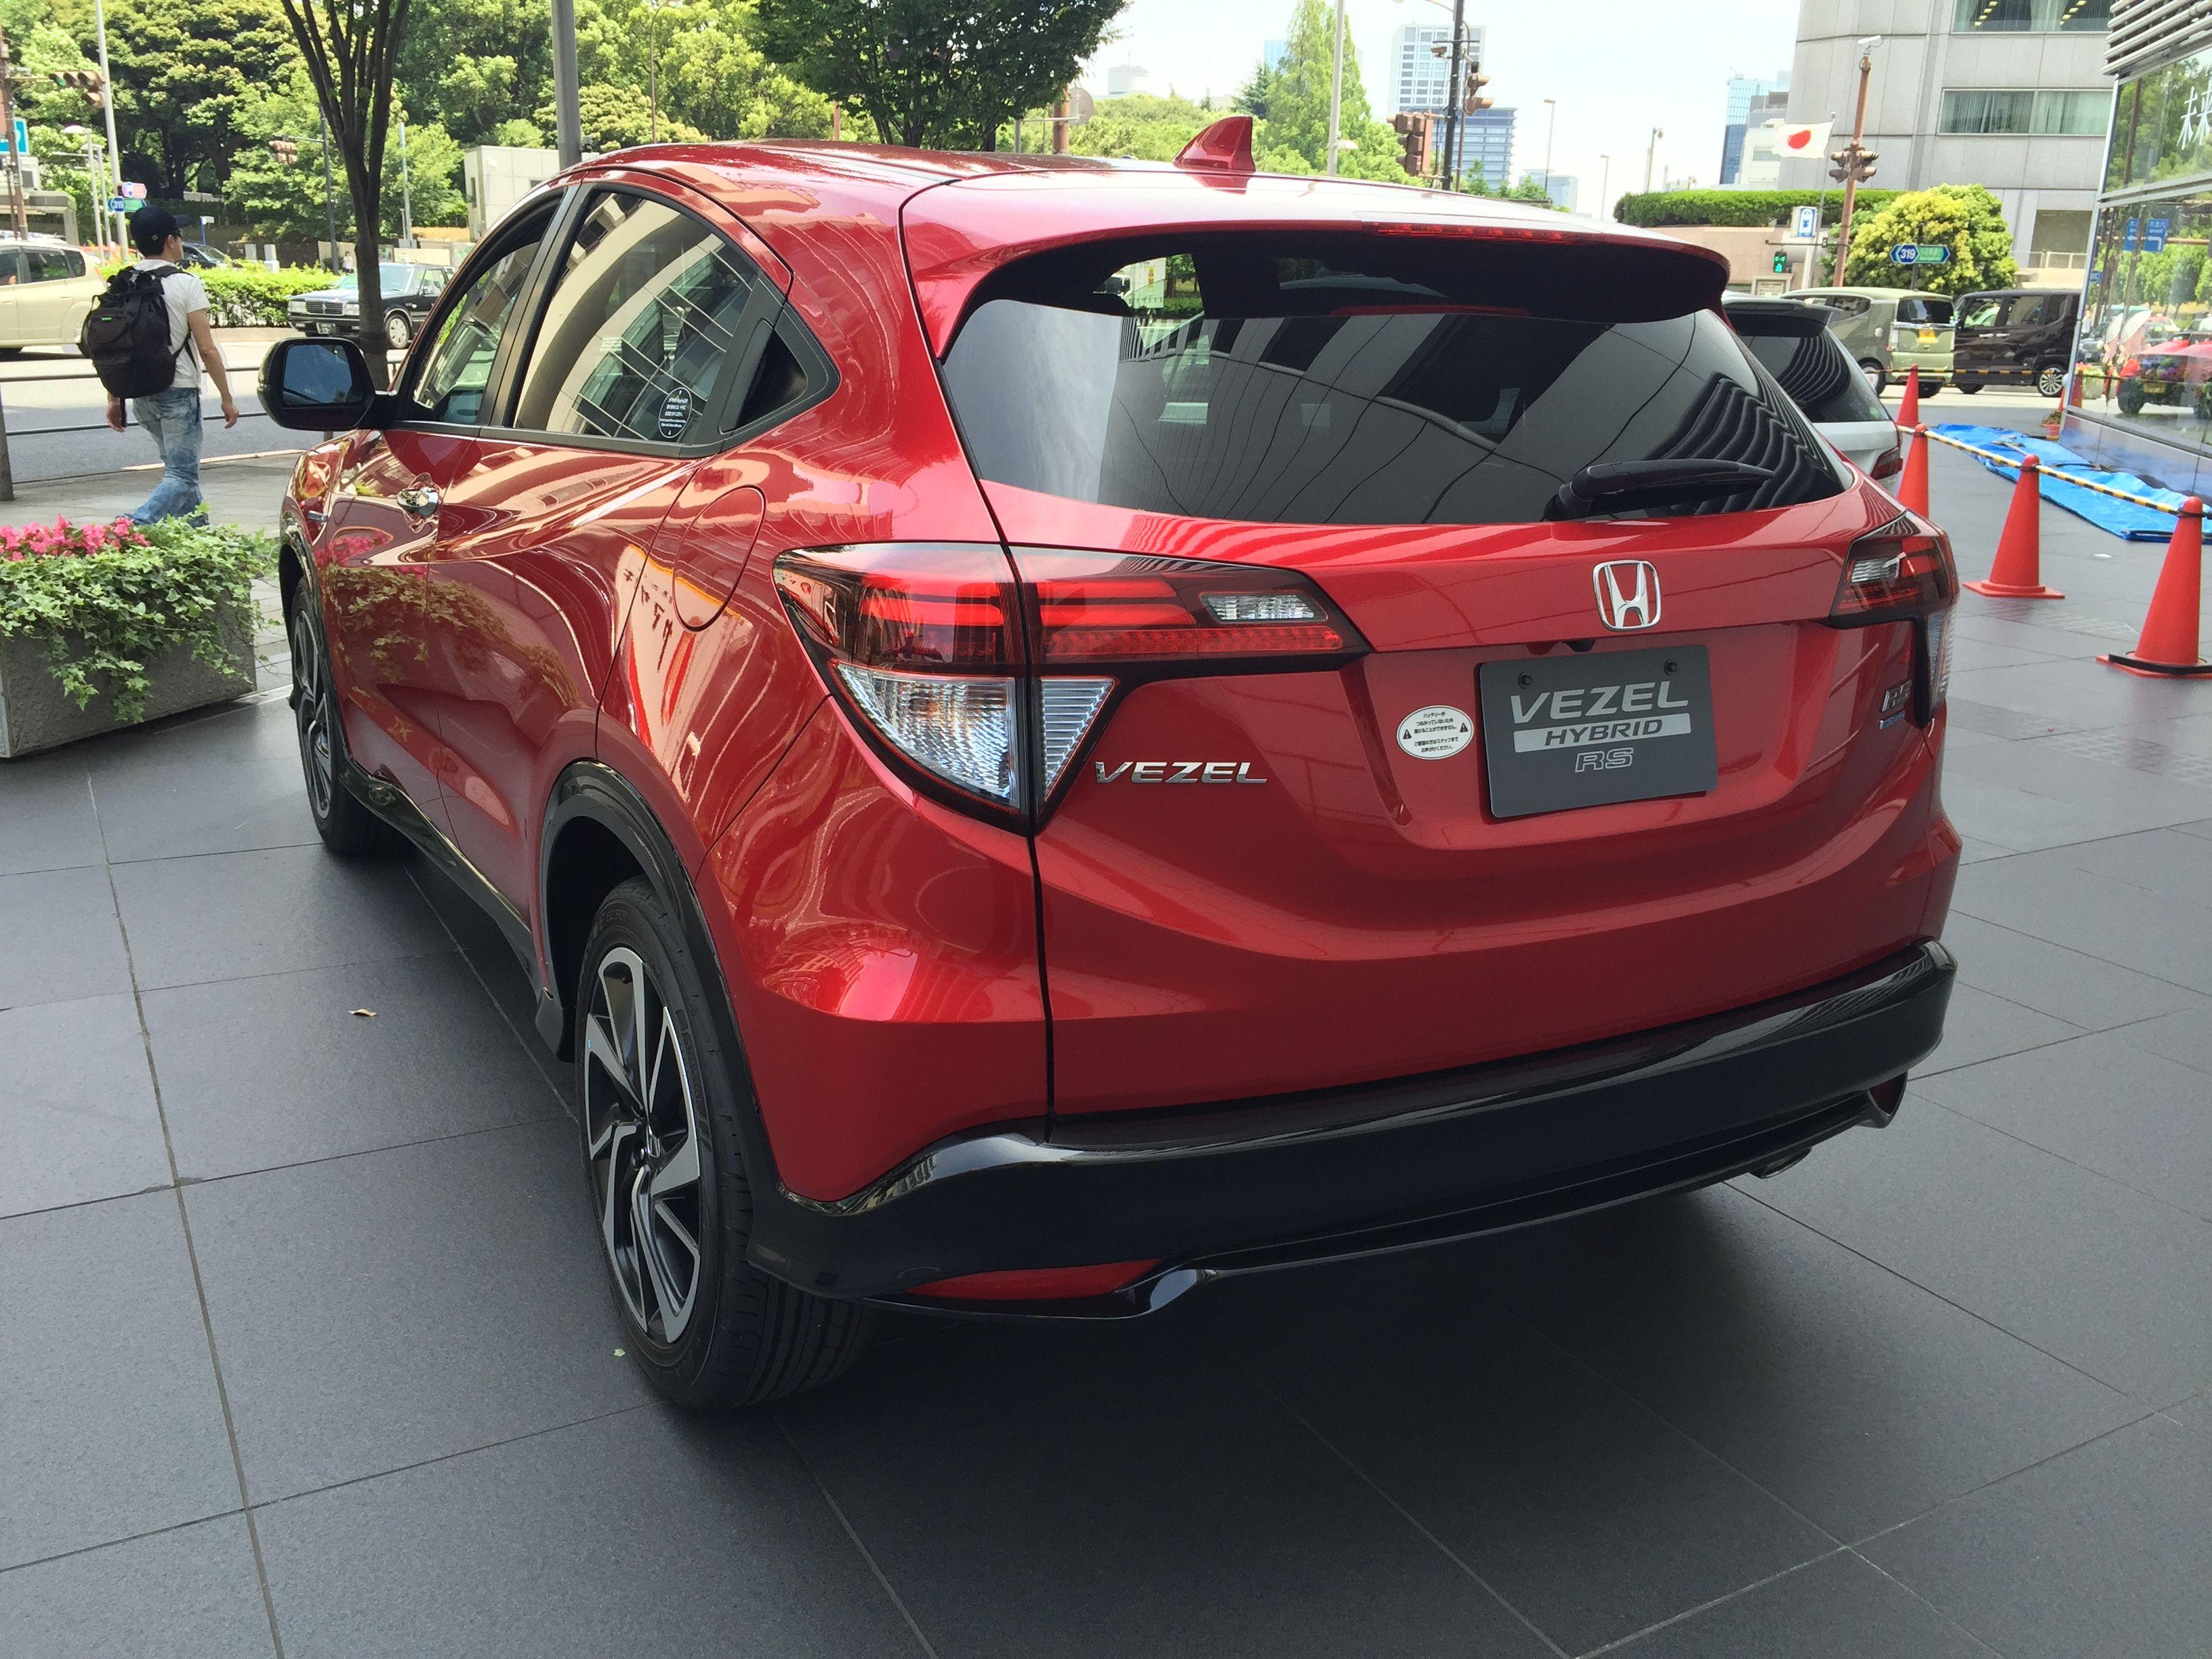 Honda vezel hybrid june 2016 harold archer